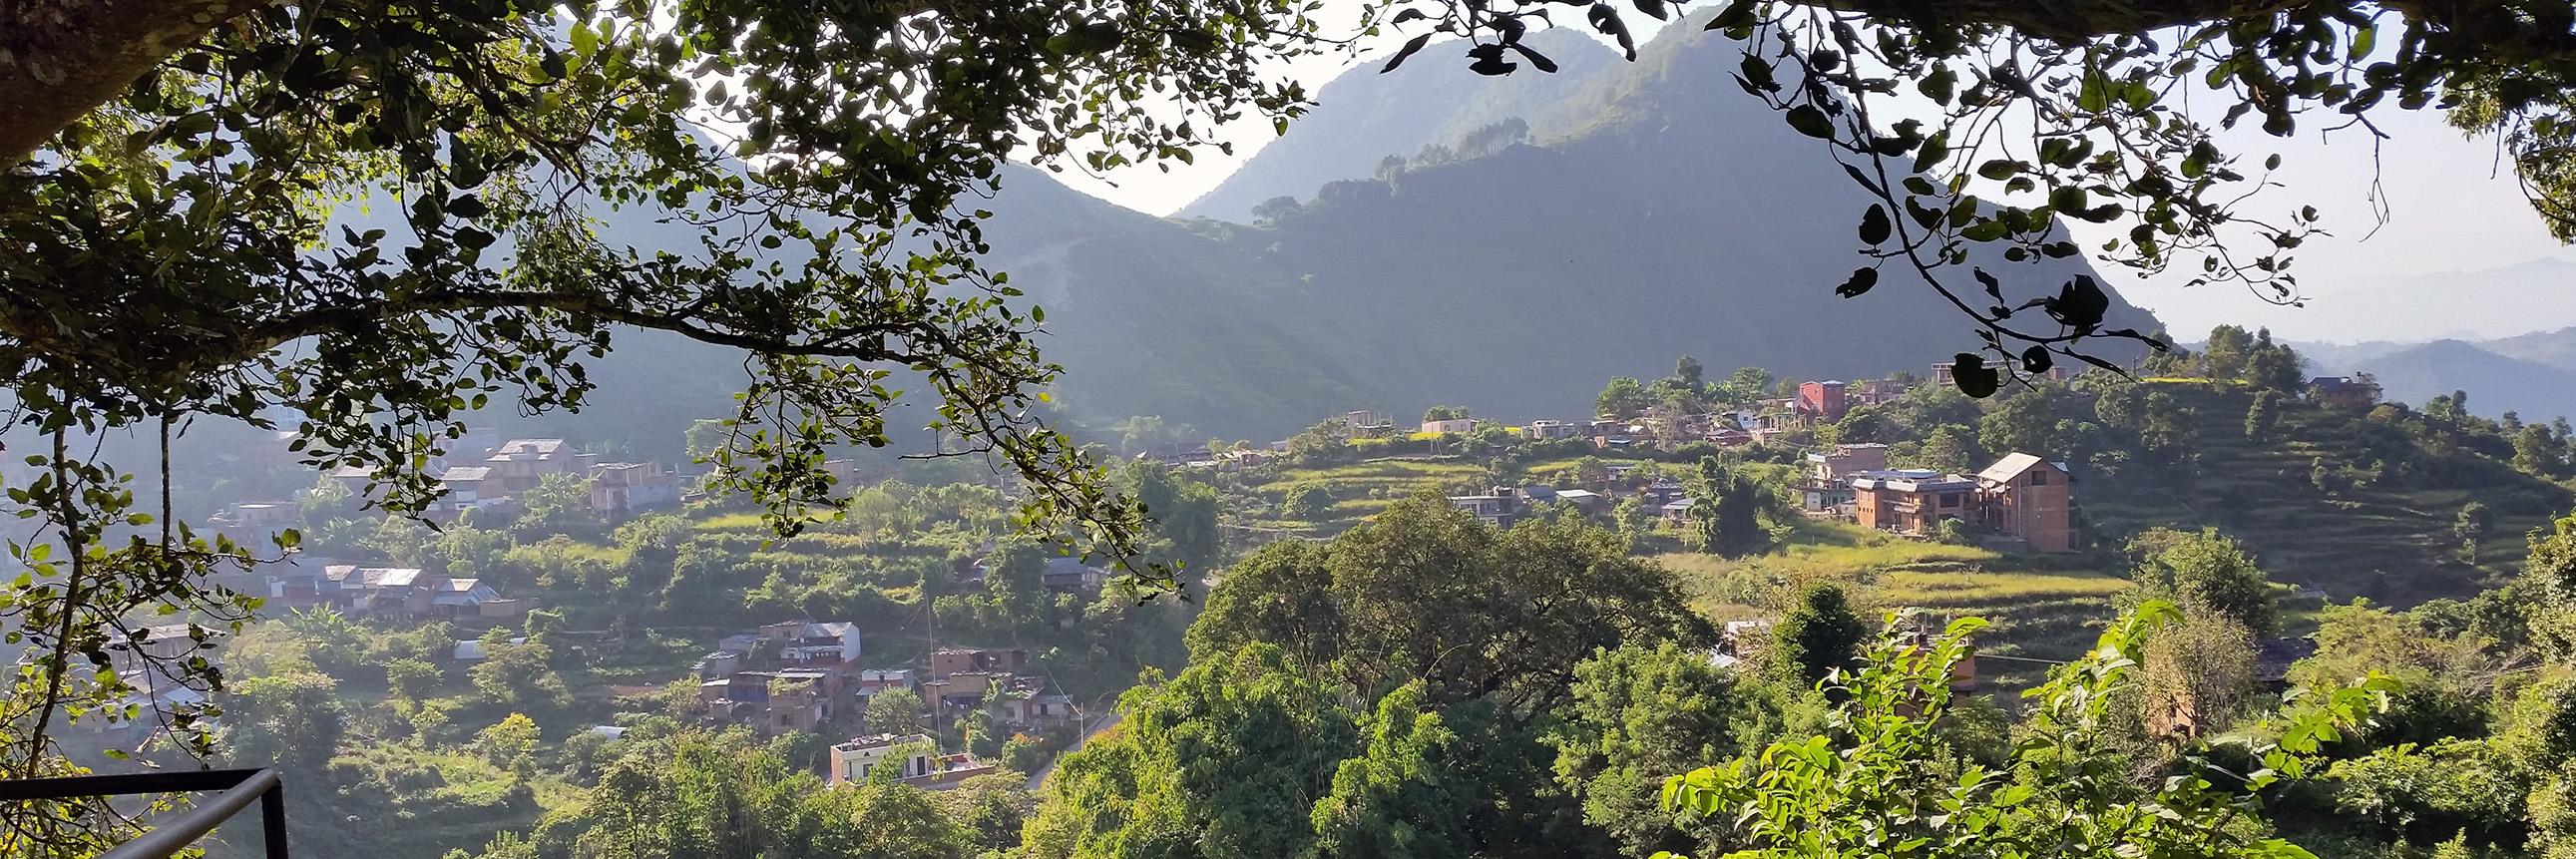 Hügellandschaft um Bandipur